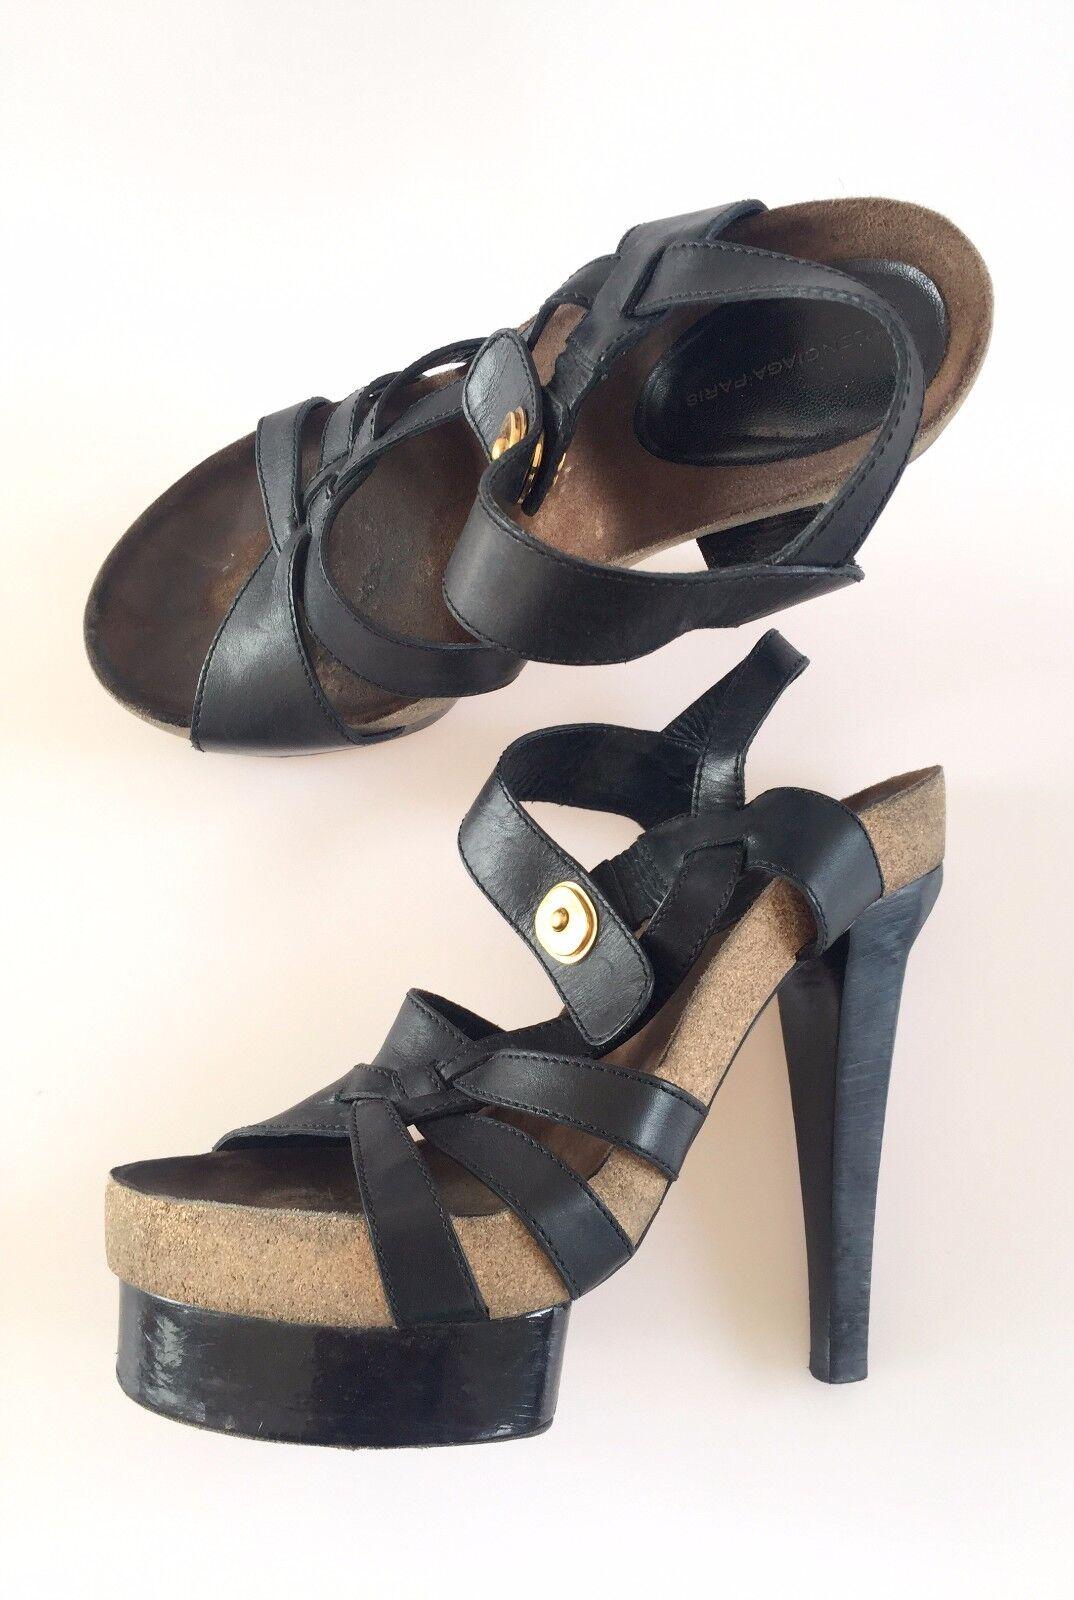 Balenciaga Ghesquiere Cork Gladiatore 40 highheel SZ scarpe Platform SZ highheel   c1b693